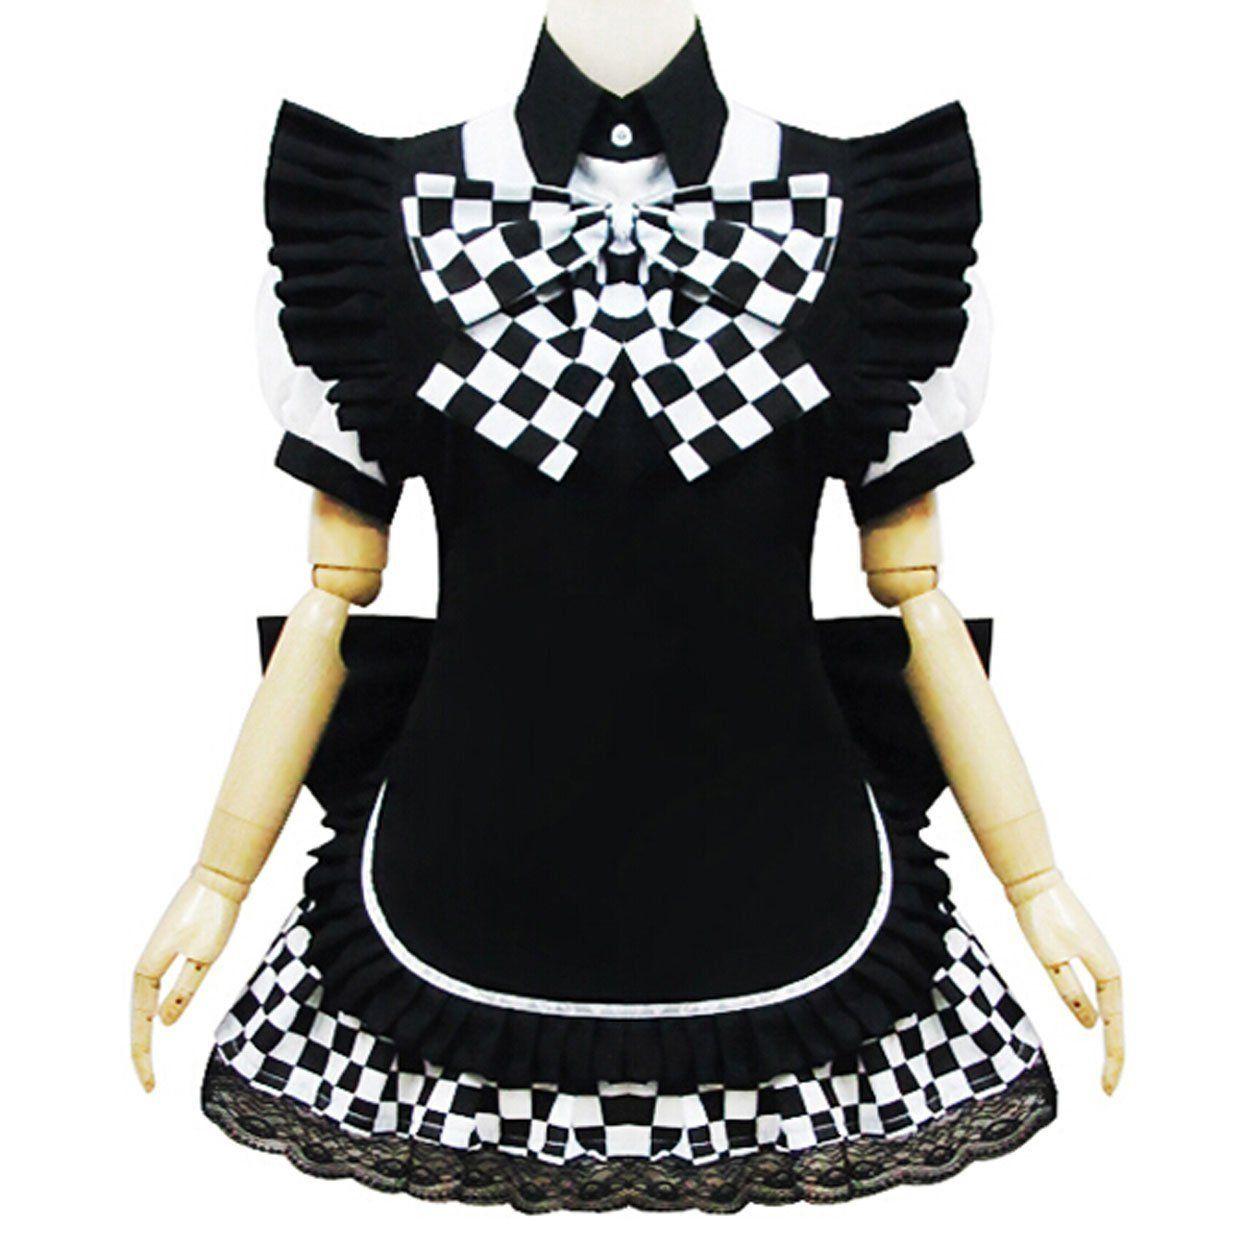 Relaxcos Haiyore Nyaruani Nyaruko Maid Outfit Cosplay